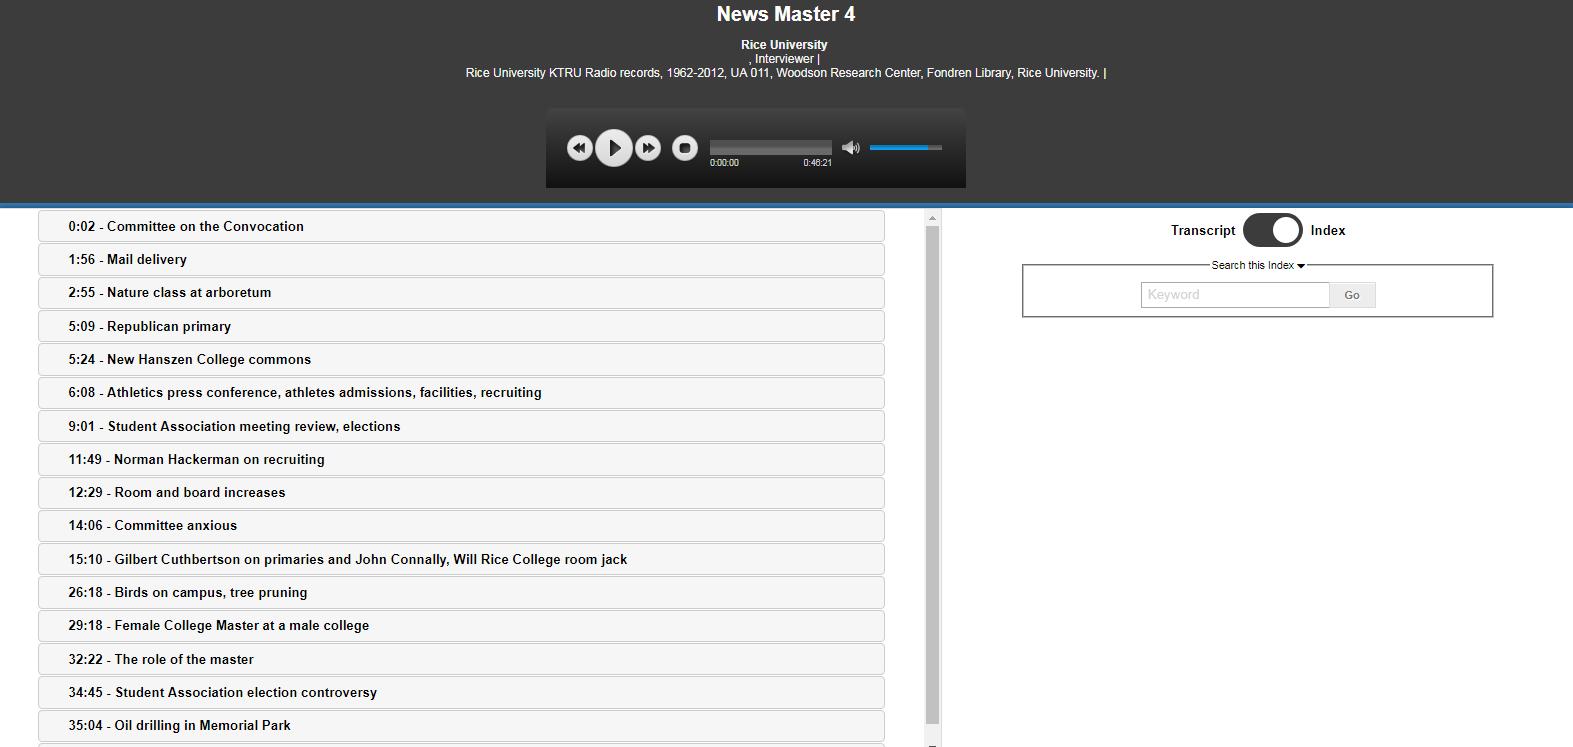 news-master-01